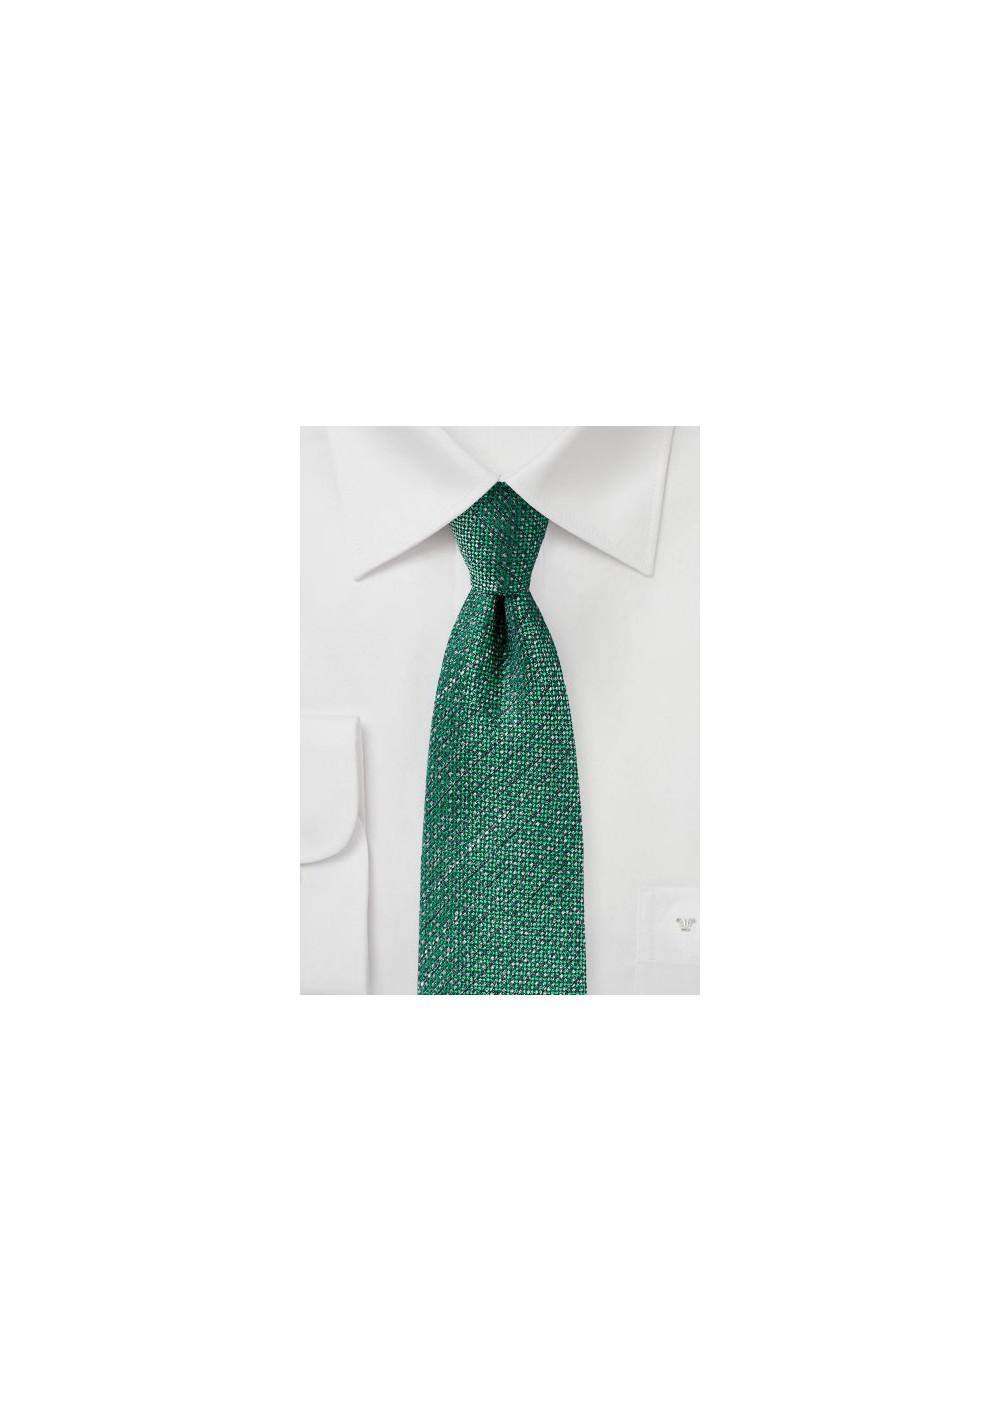 Kelly Green Tie in Recycled Yarn